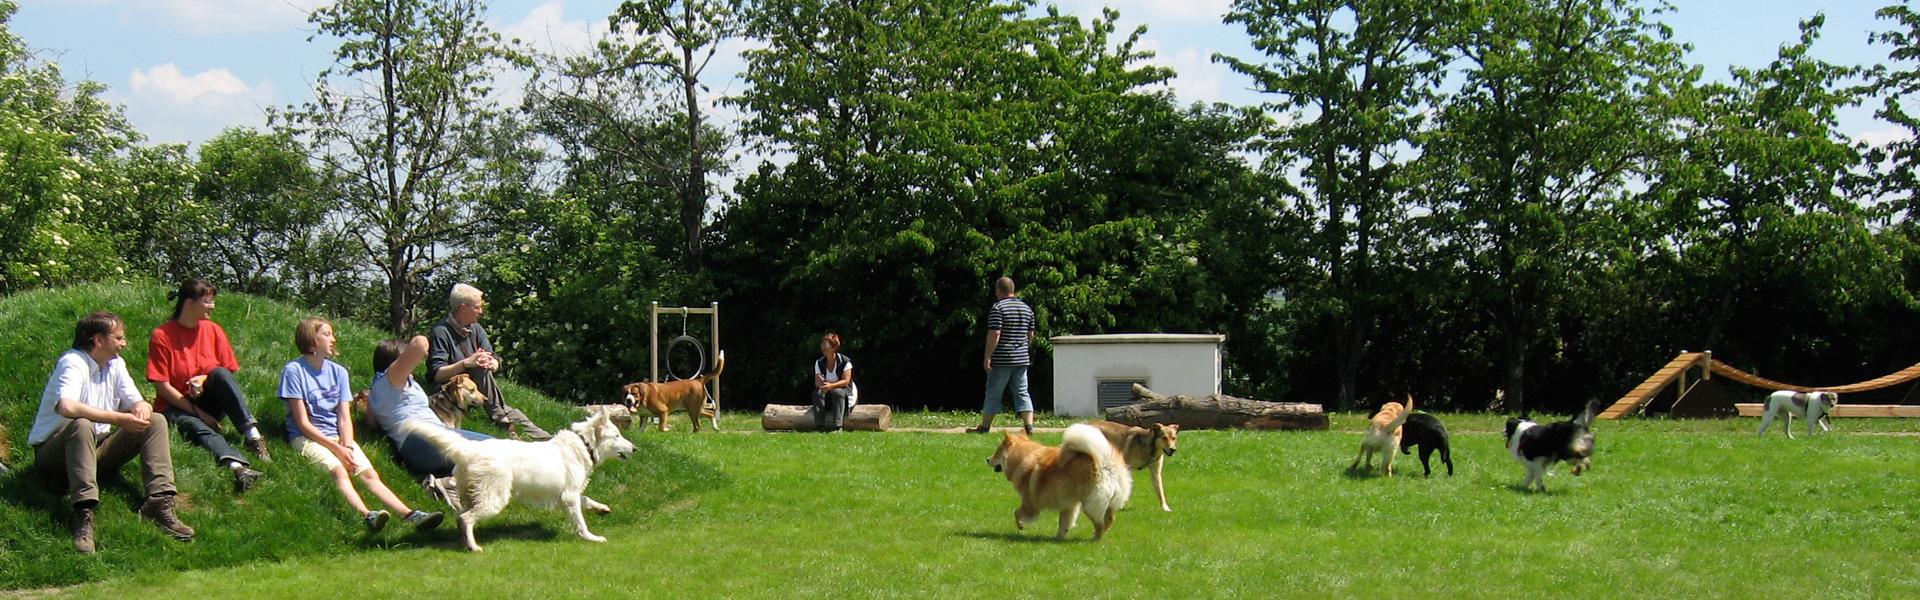 Hundespielplatz